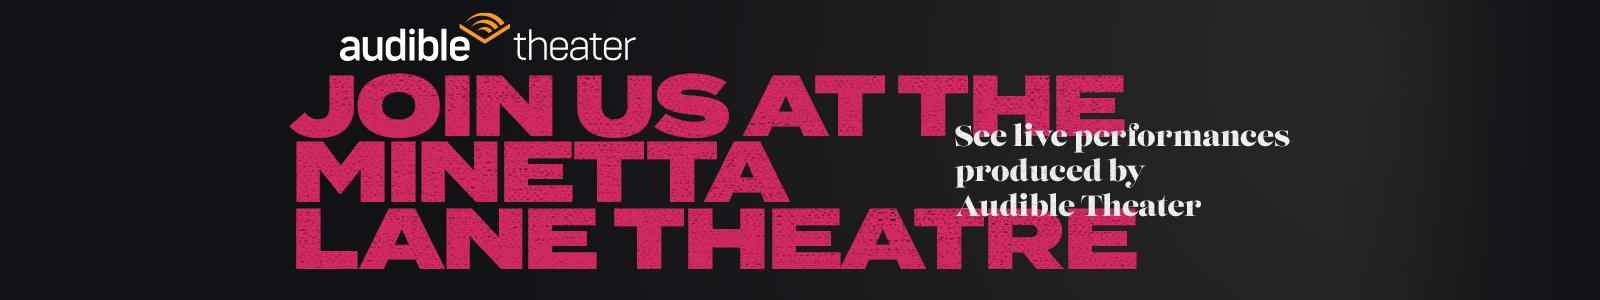 Join us at the Minetta Lane Theater